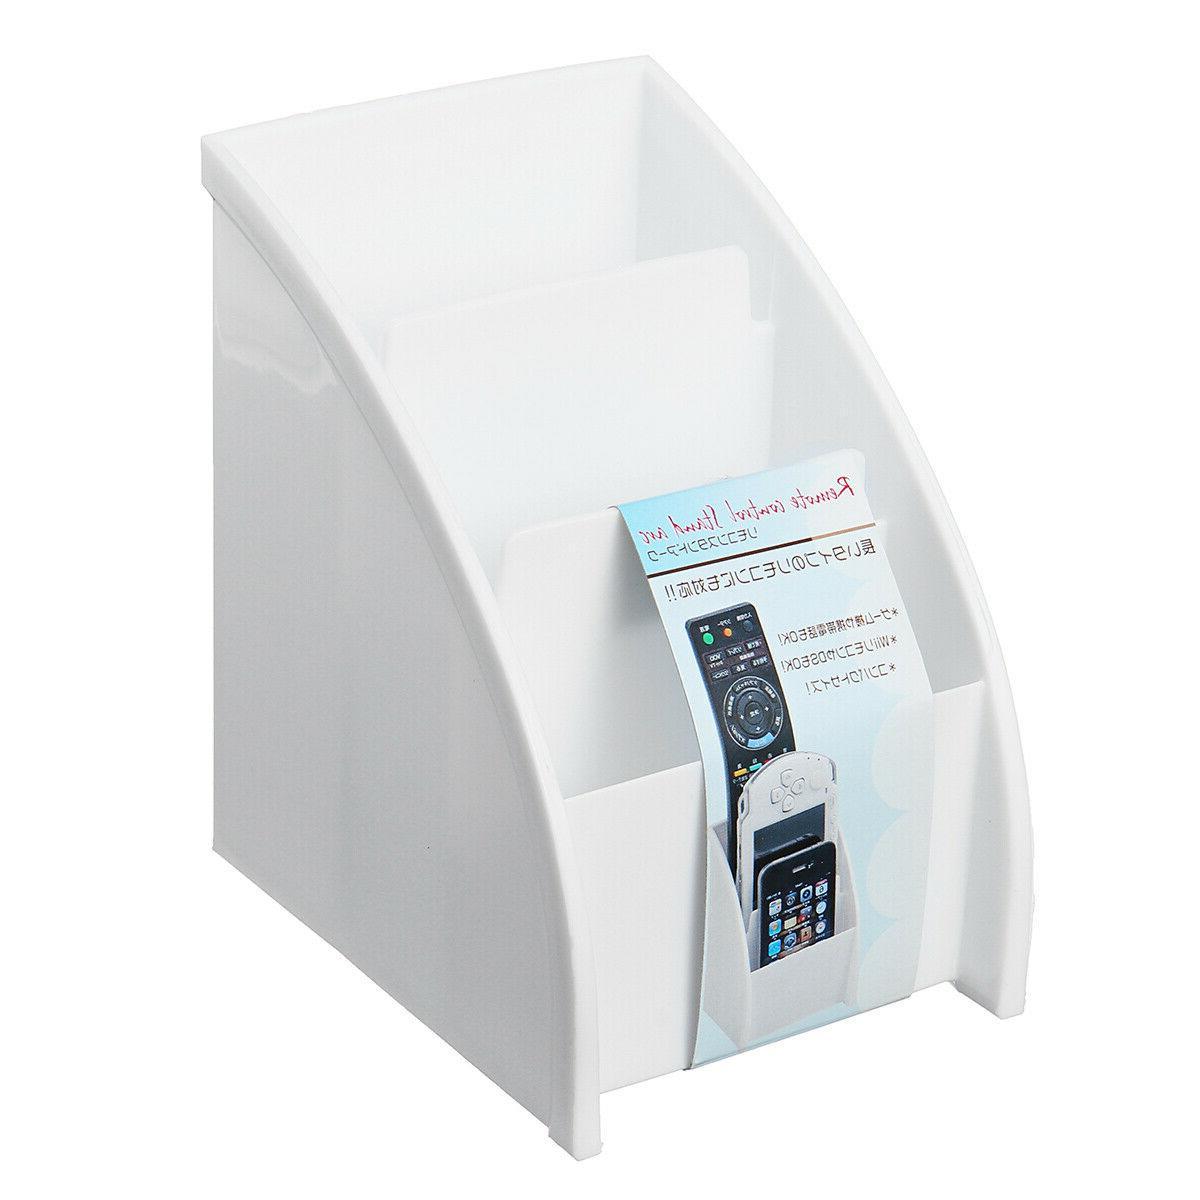 Phone/TV Control Box Desk Holder White